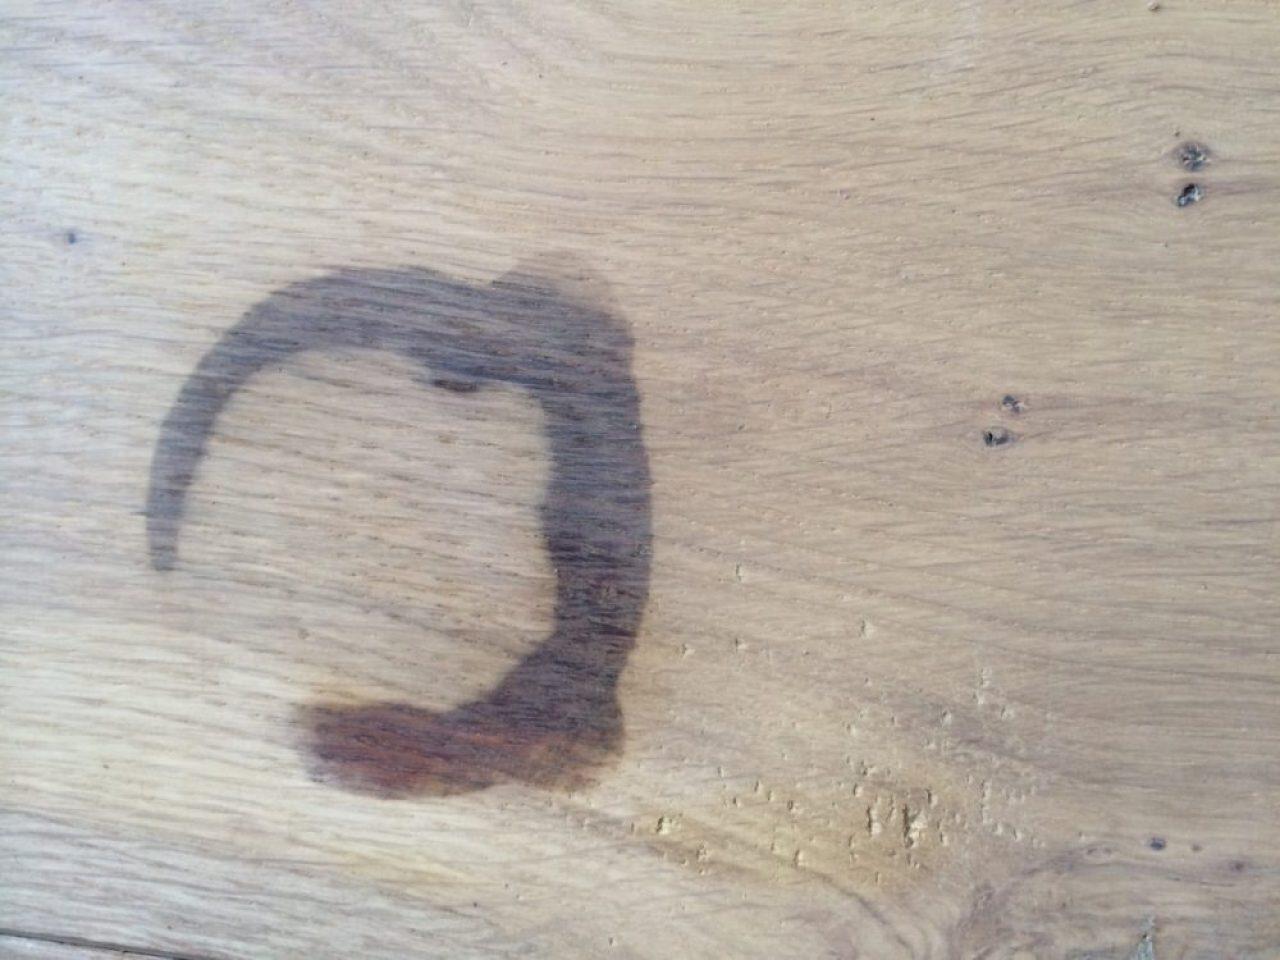 zwarte vlek in eiken vloer